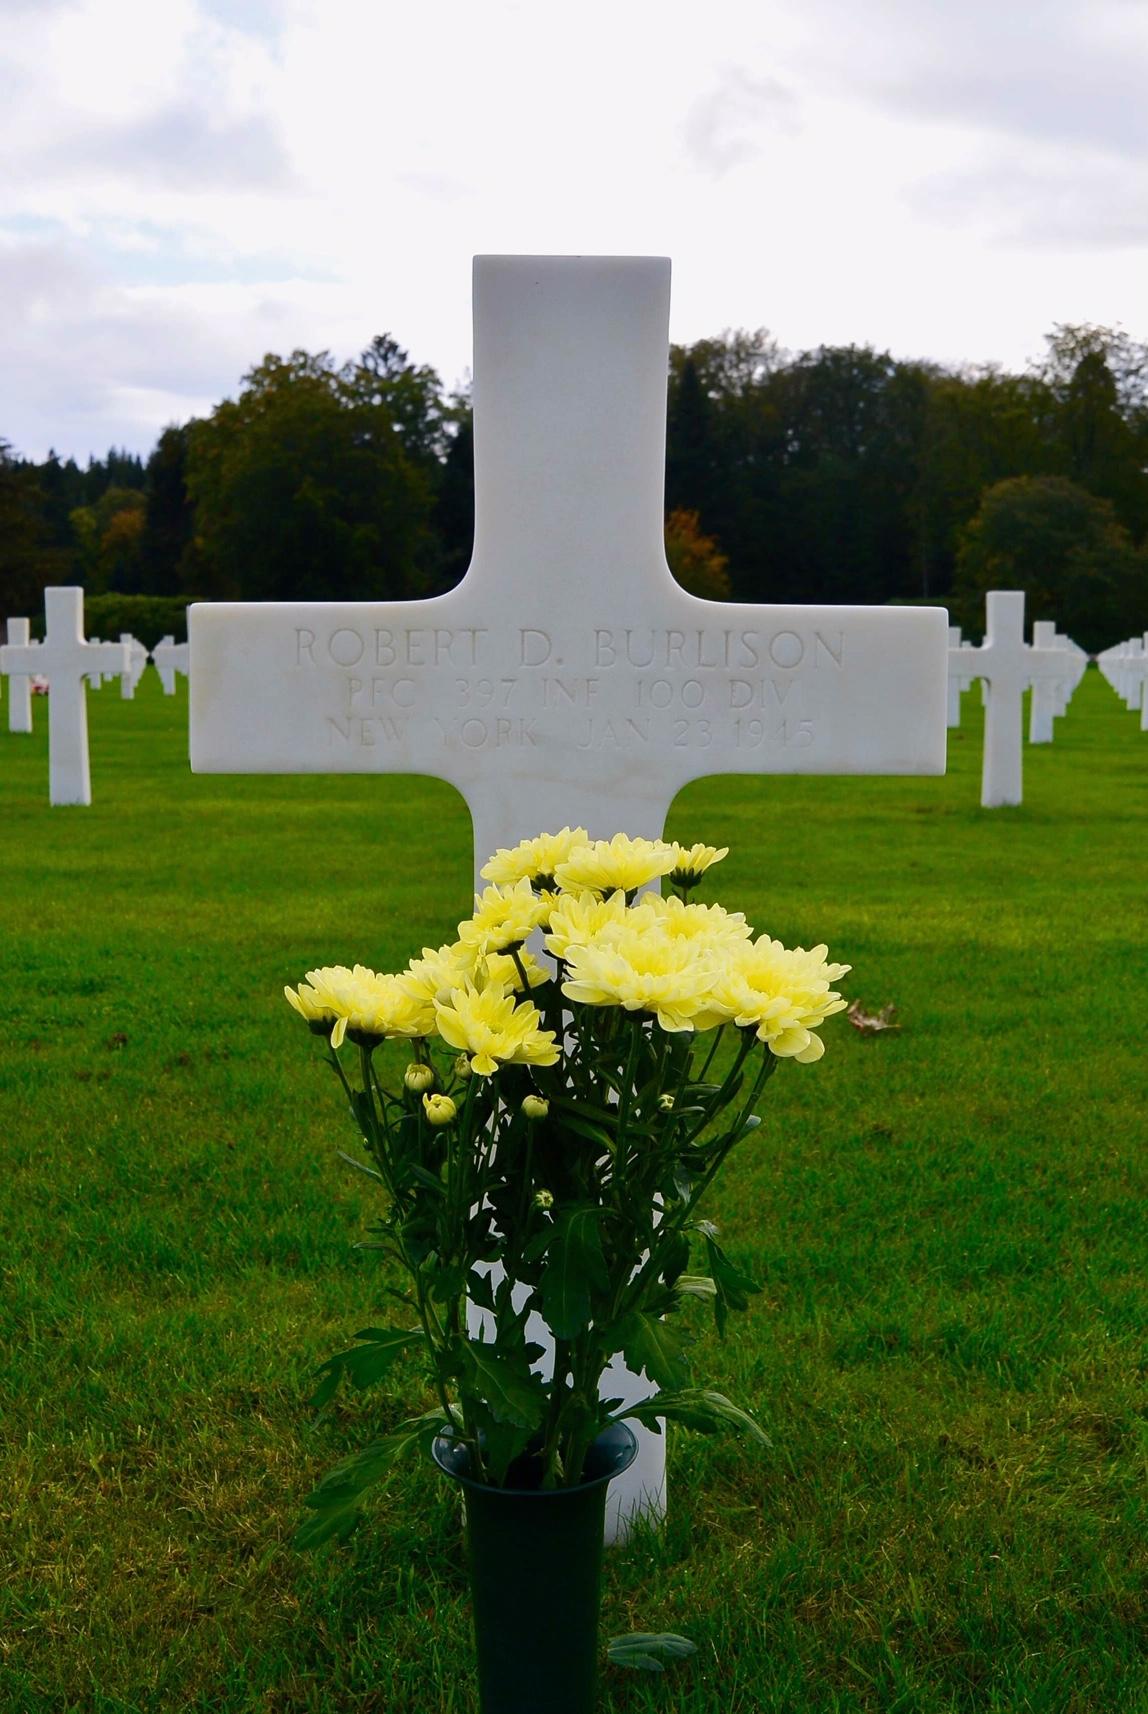 Robert D. Burlison gravesite, Epinal, France